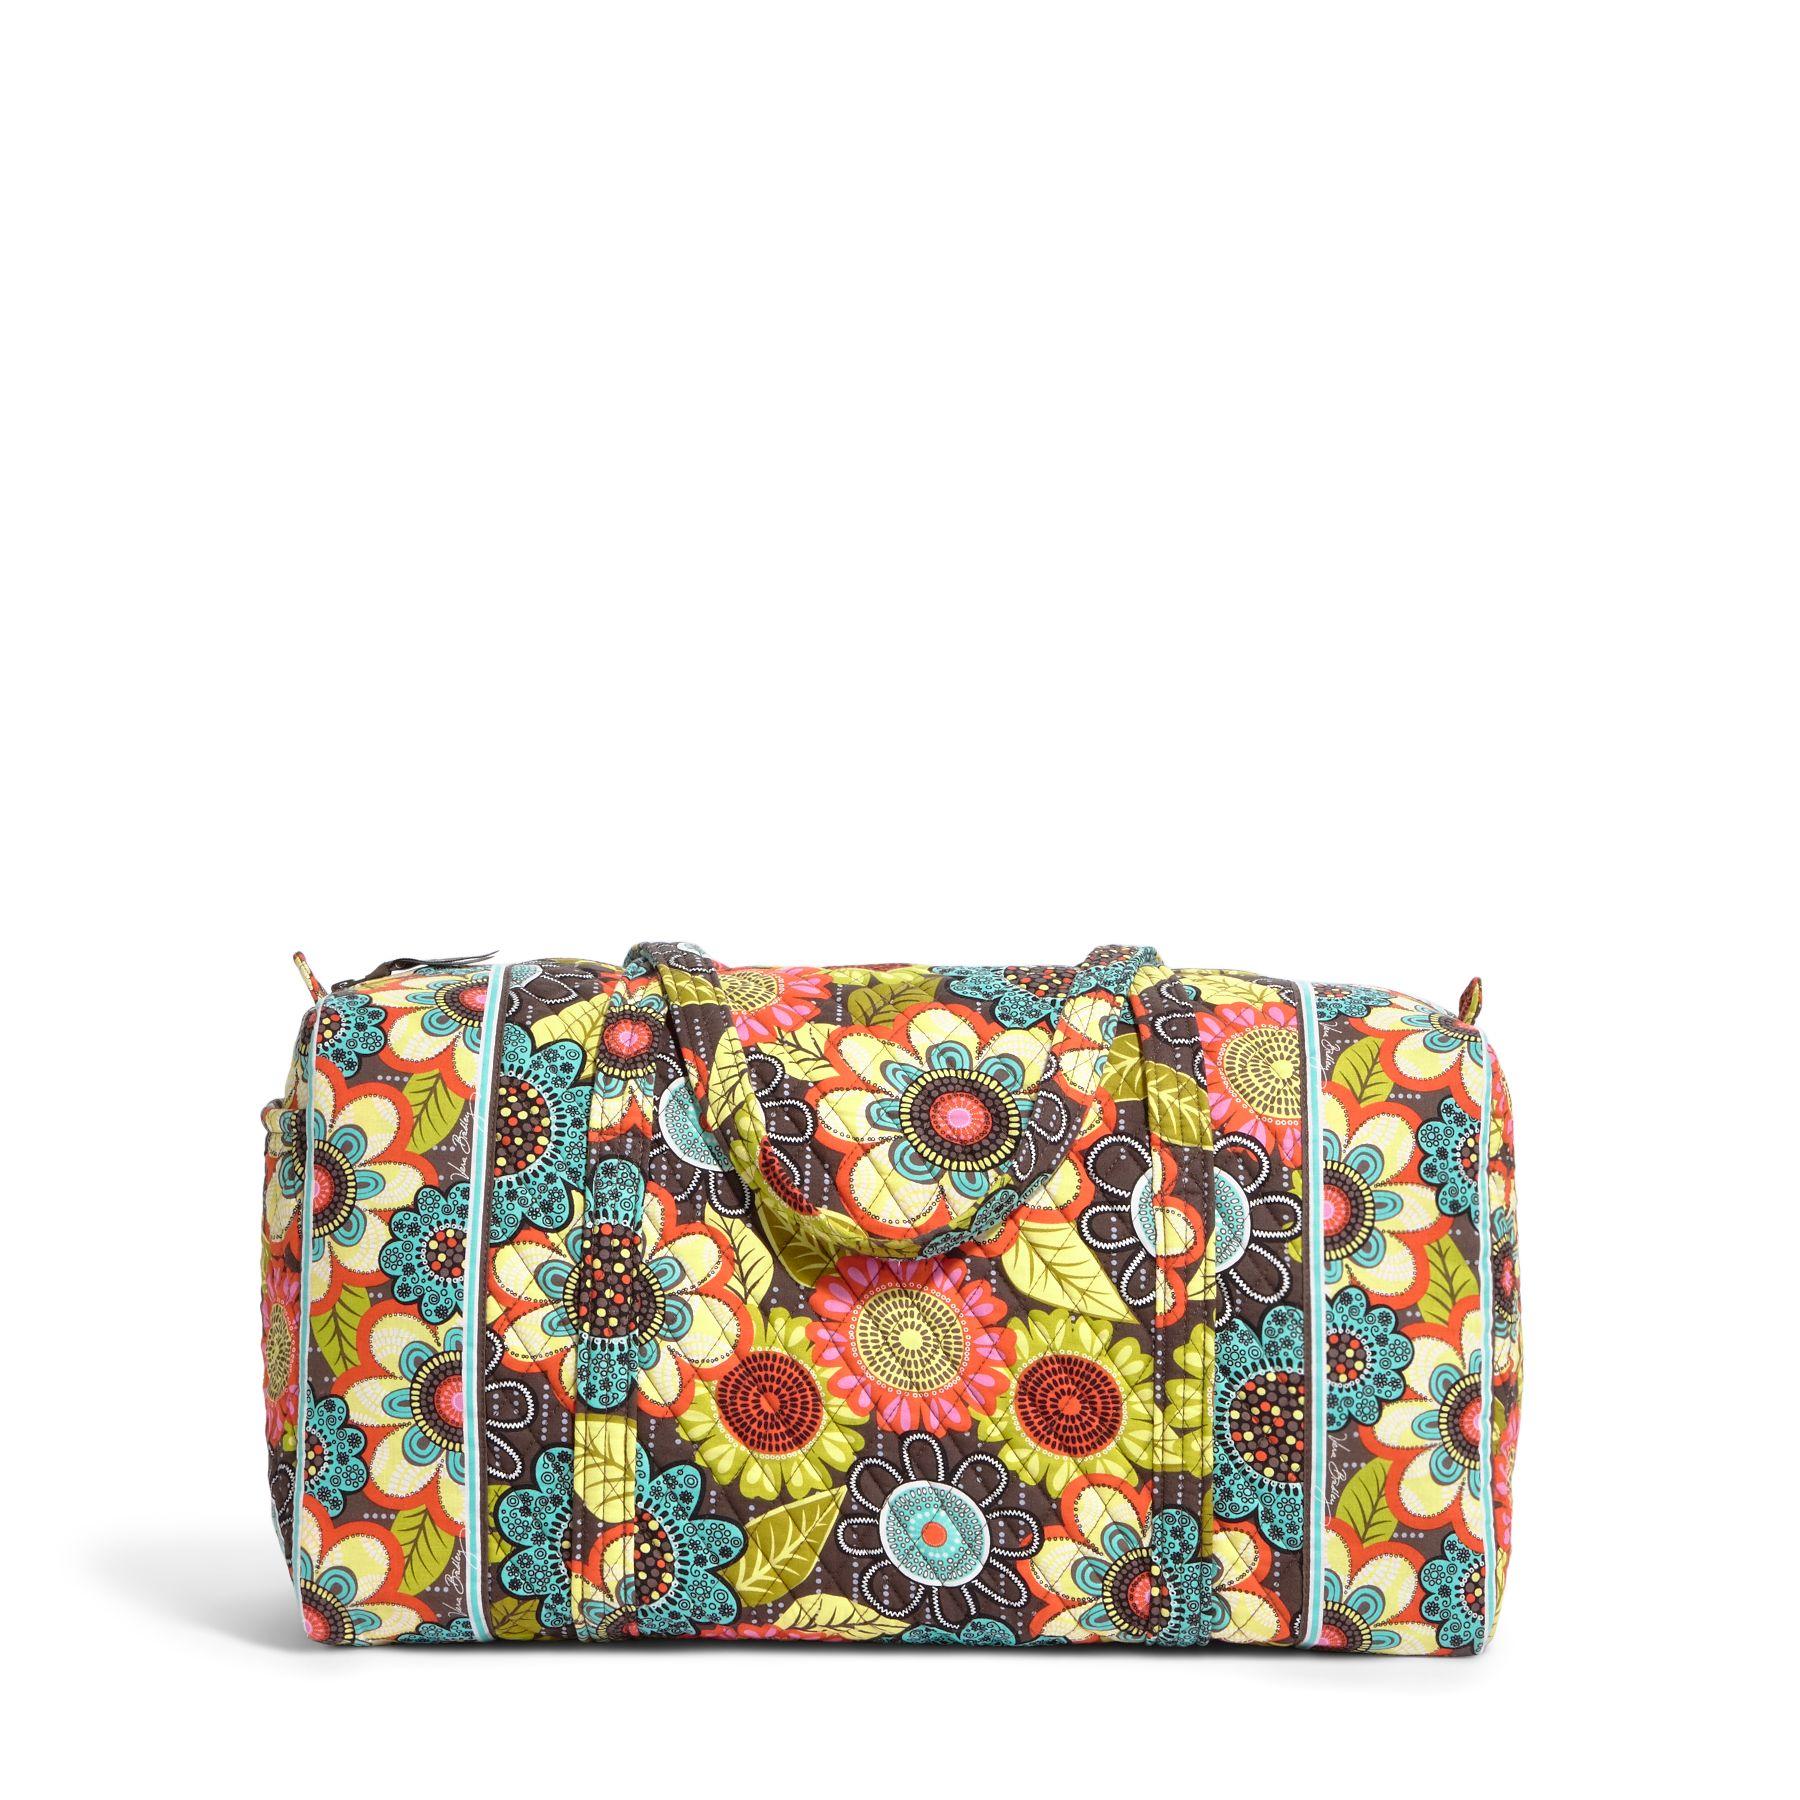 Vera Bradley Large Duffel Travel Bag in Flower Shower